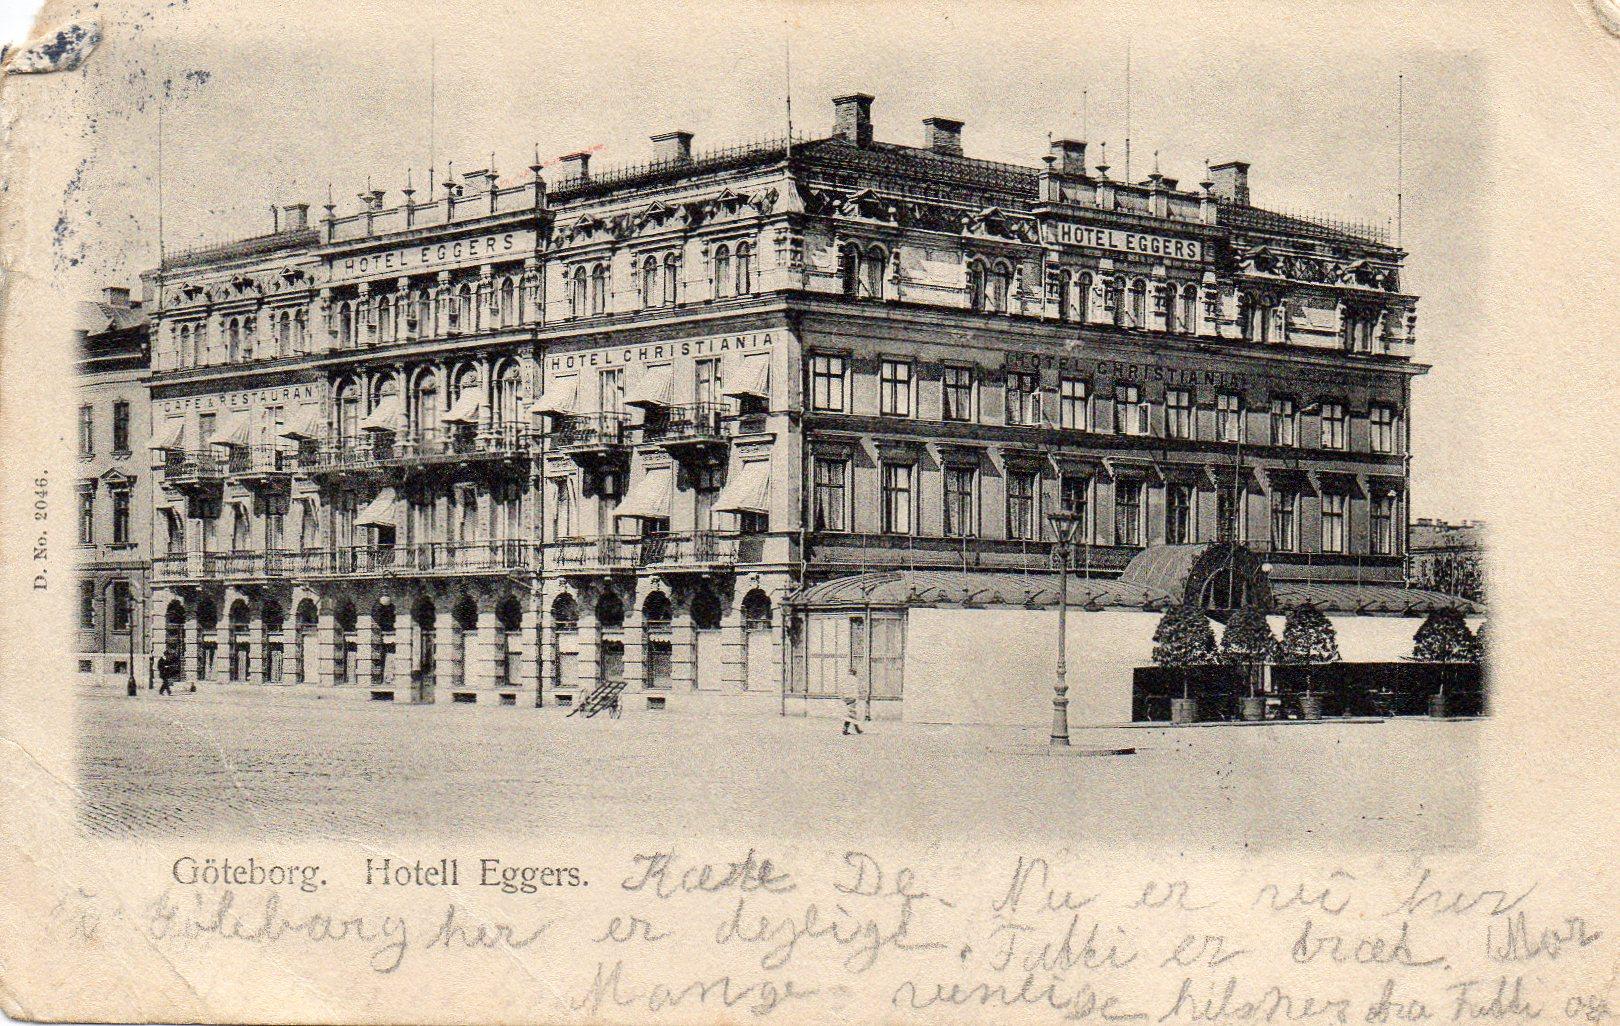 Hotel Eggers Göteborg